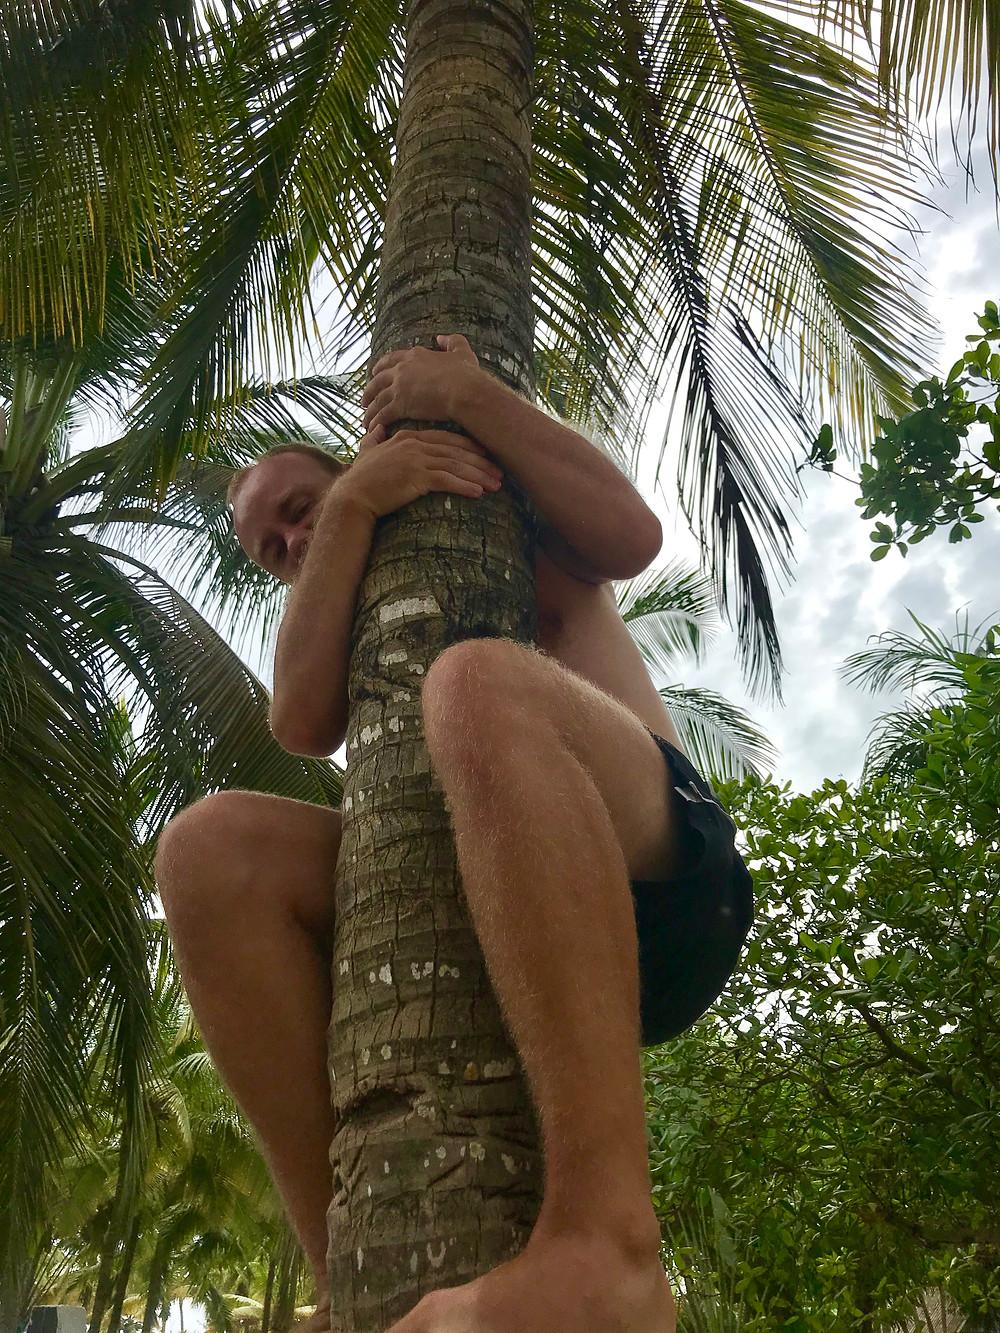 Villejä piilossa palmussa